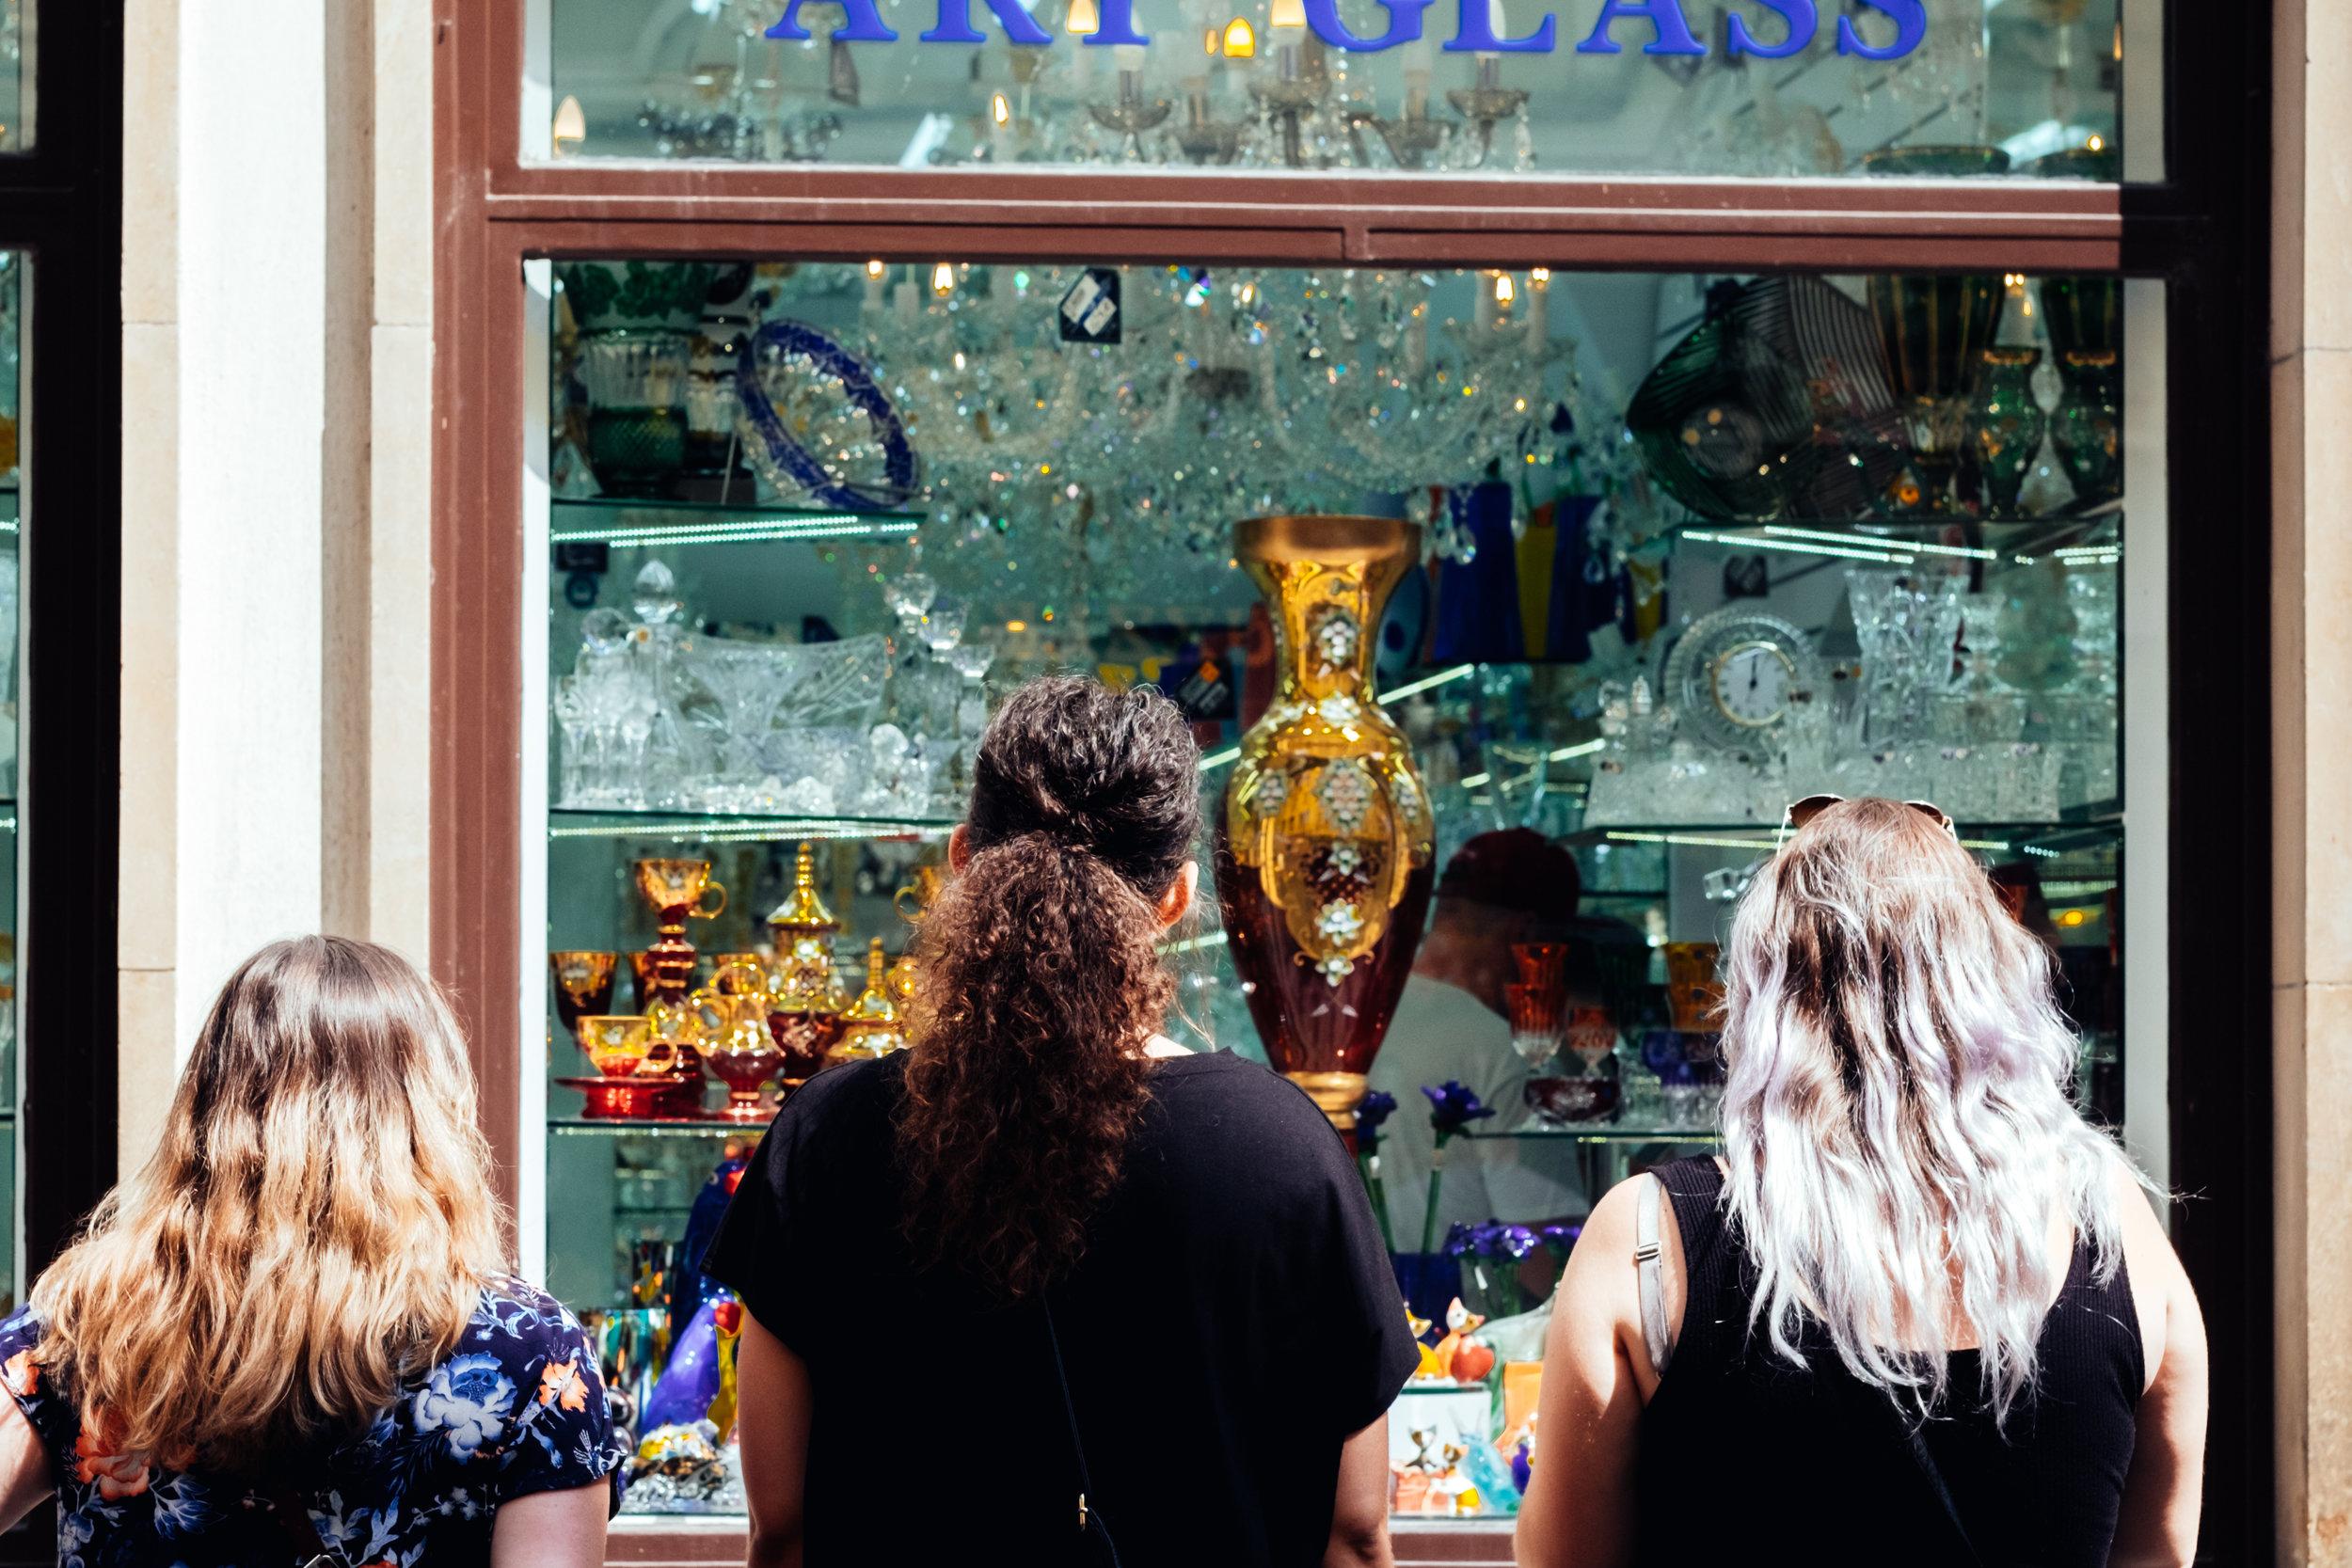 prague streets praha old town crystal shop